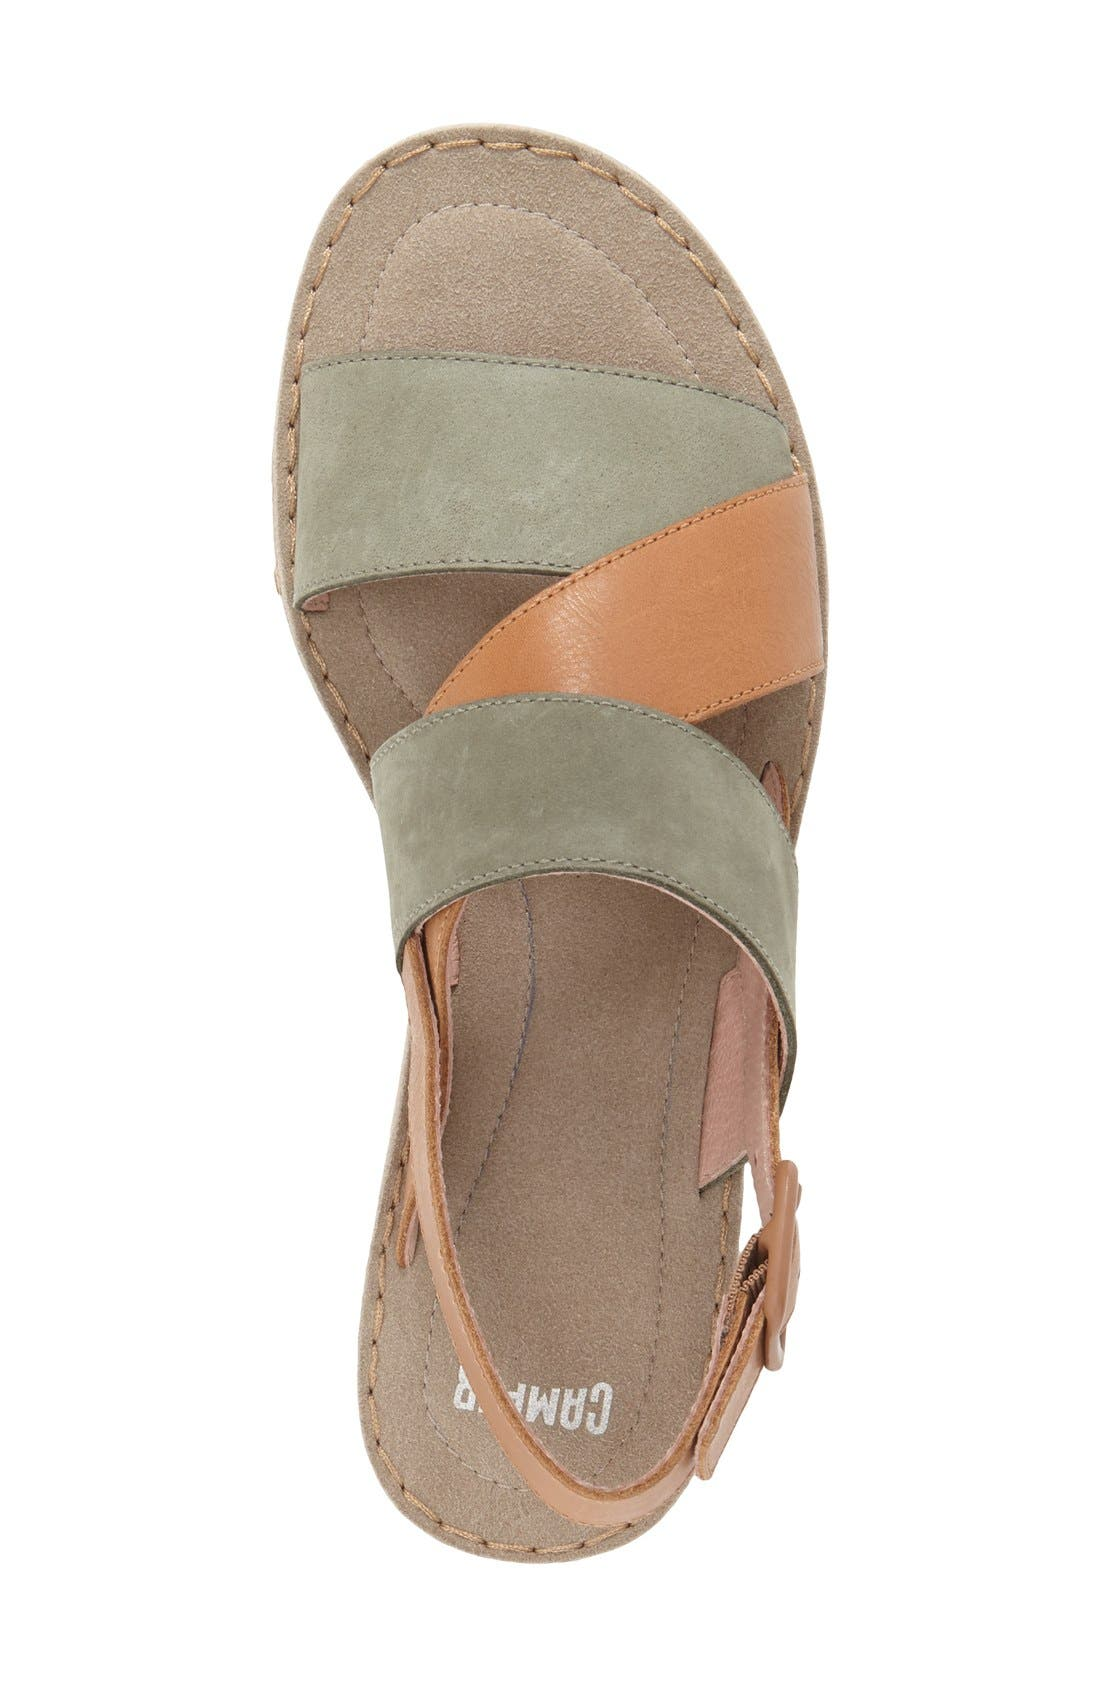 Alternate Image 3  - Camper 'Pimpom' Leather & Suede Crisscross Strap Sandal (Women)